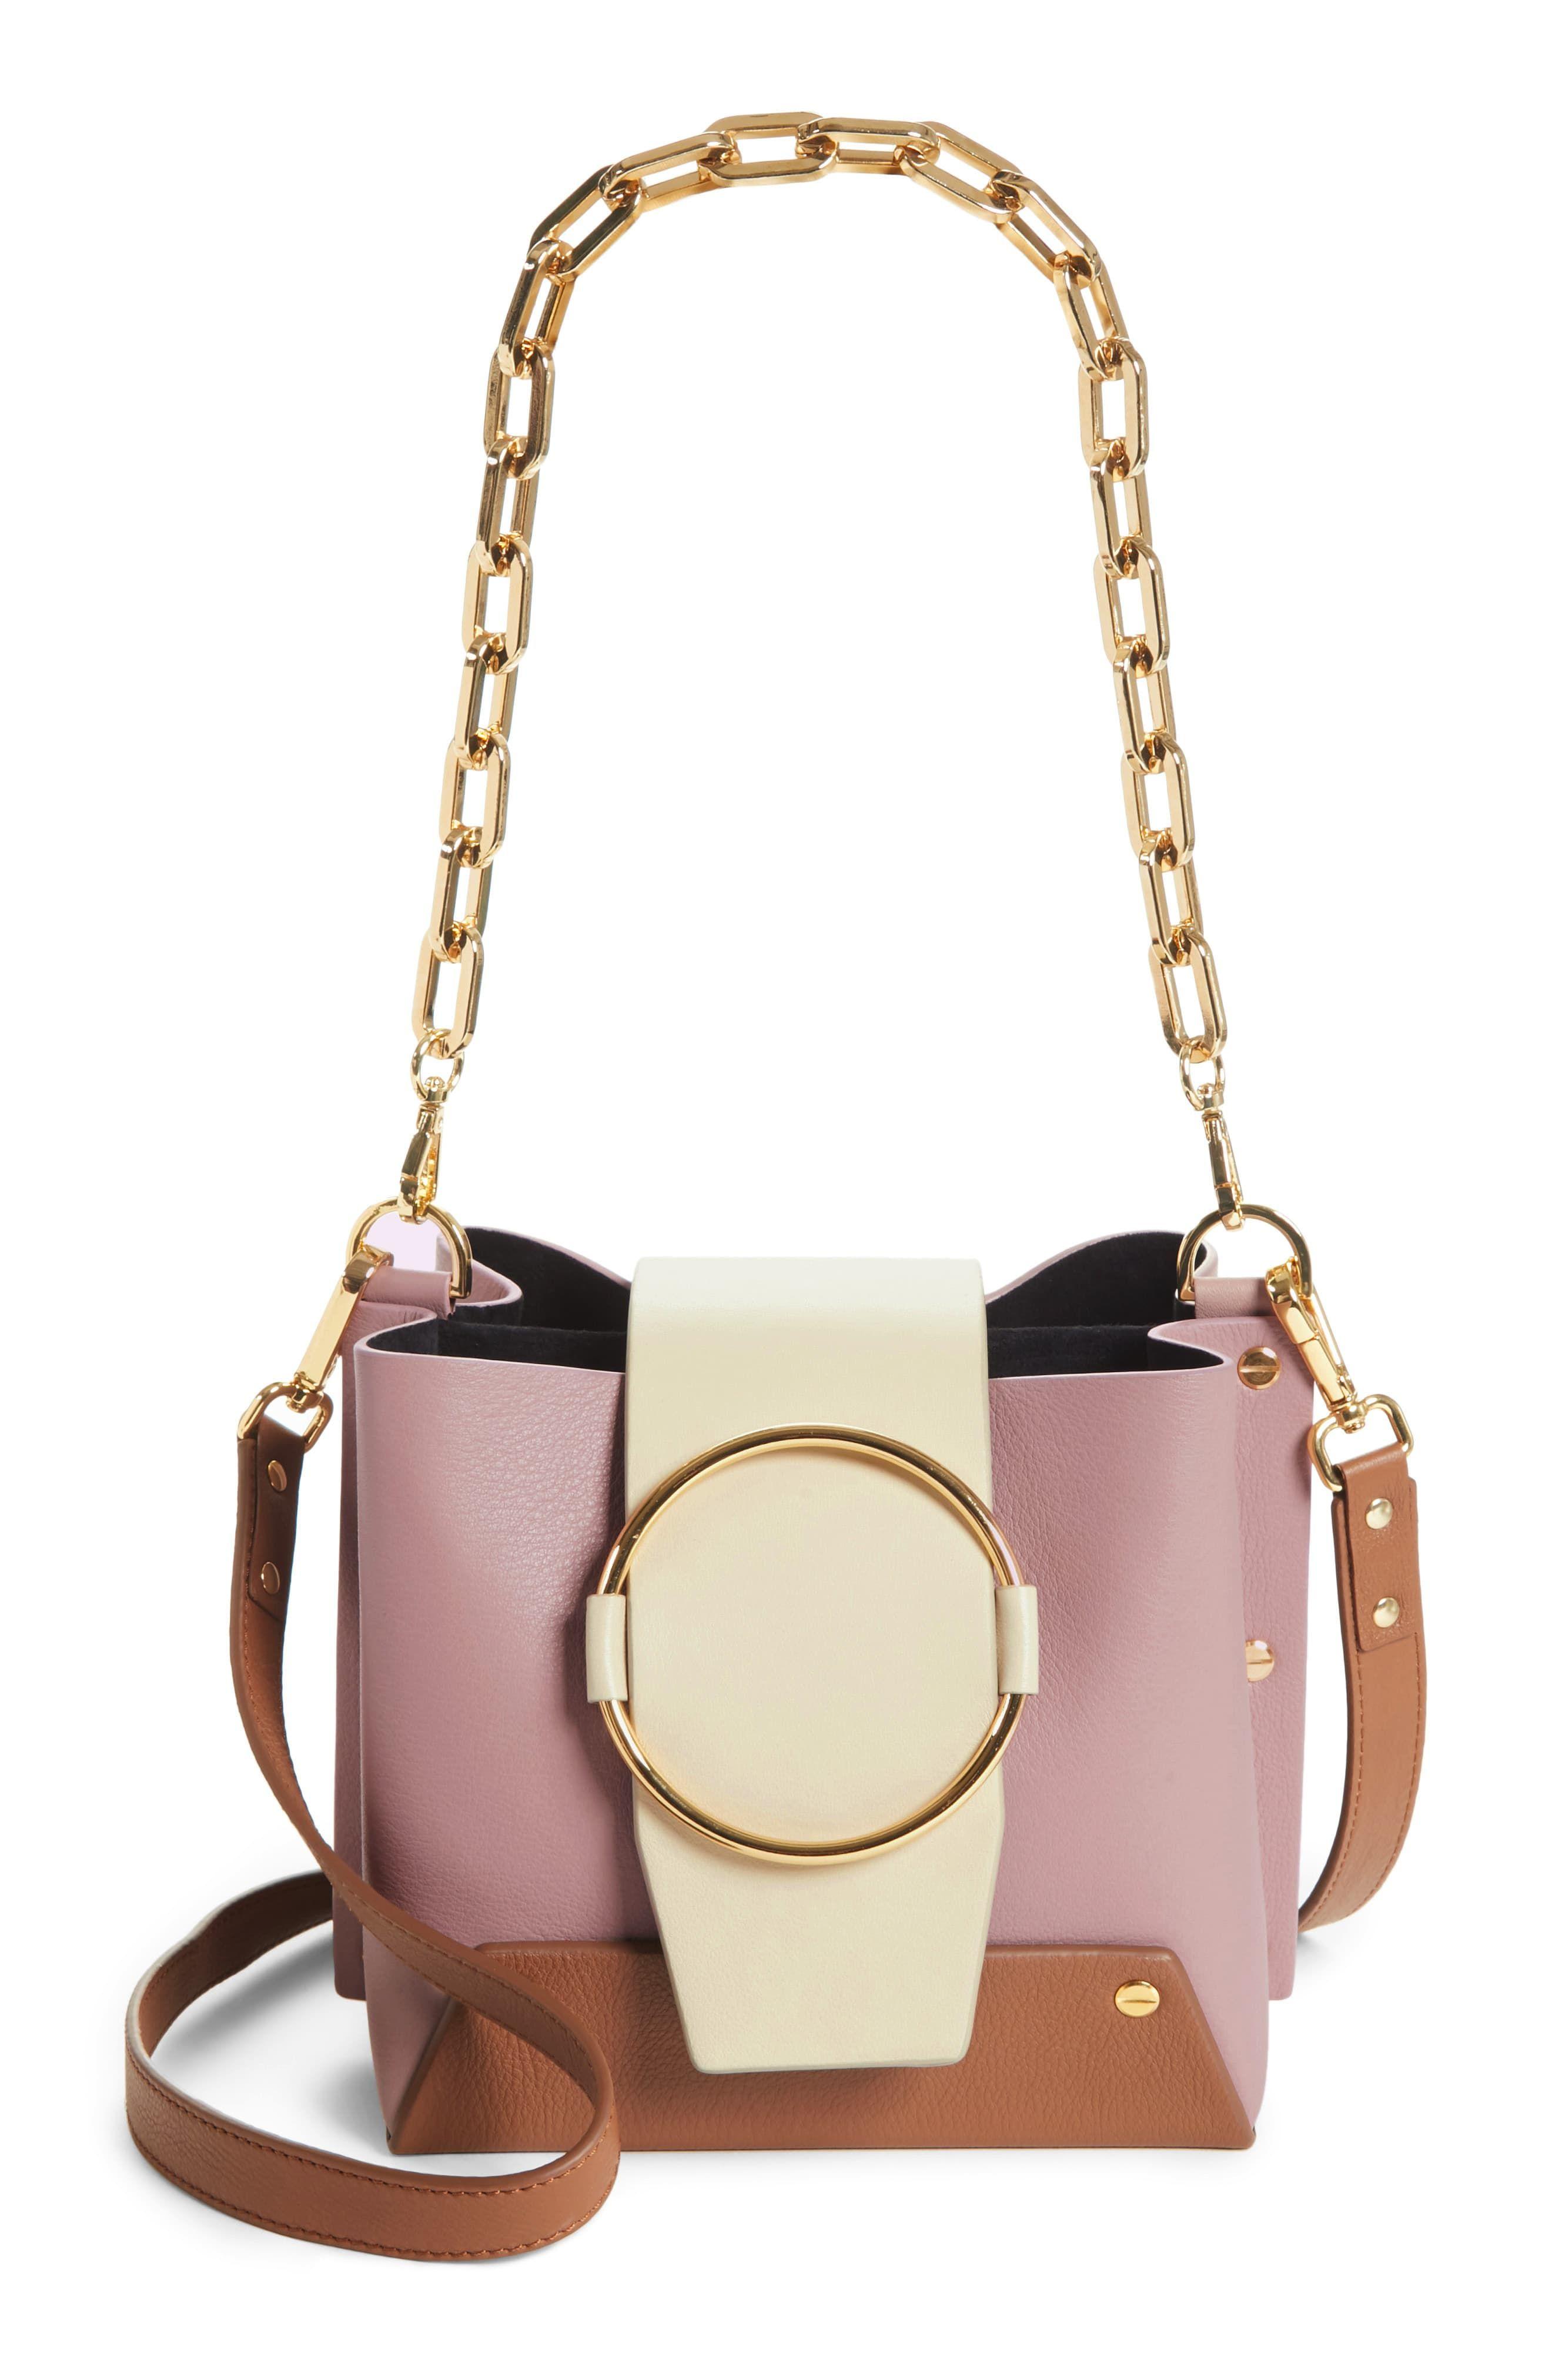 62b2cefbe1 Yuzefi Delia Bucket Bag in 2019 | Products | Bags, Bucket bag ...